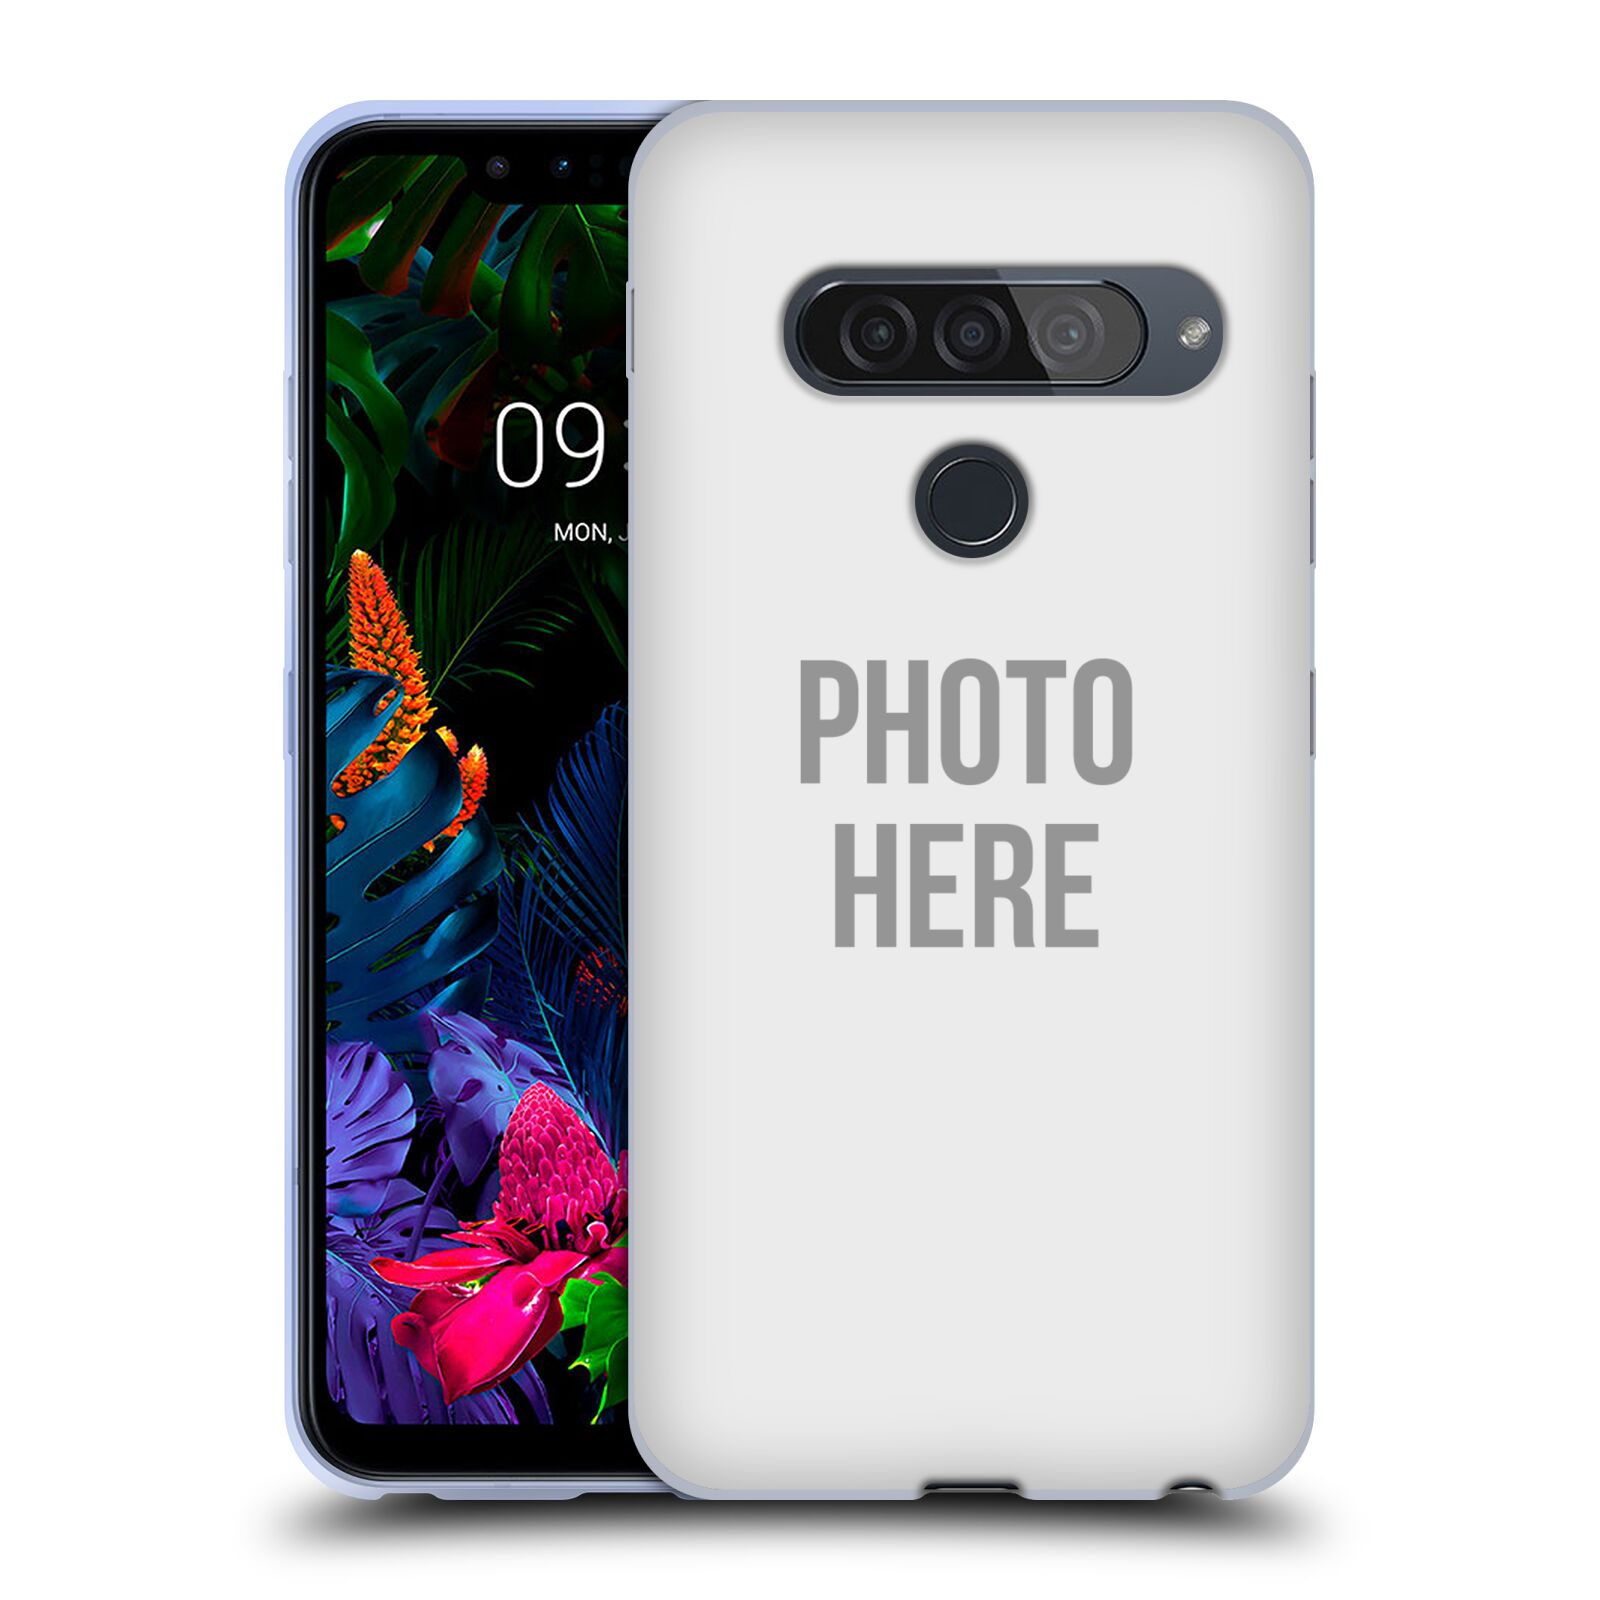 Silikonové pouzdro na mobil LG G8s ThinQ - Head Case - s vlastním motivem